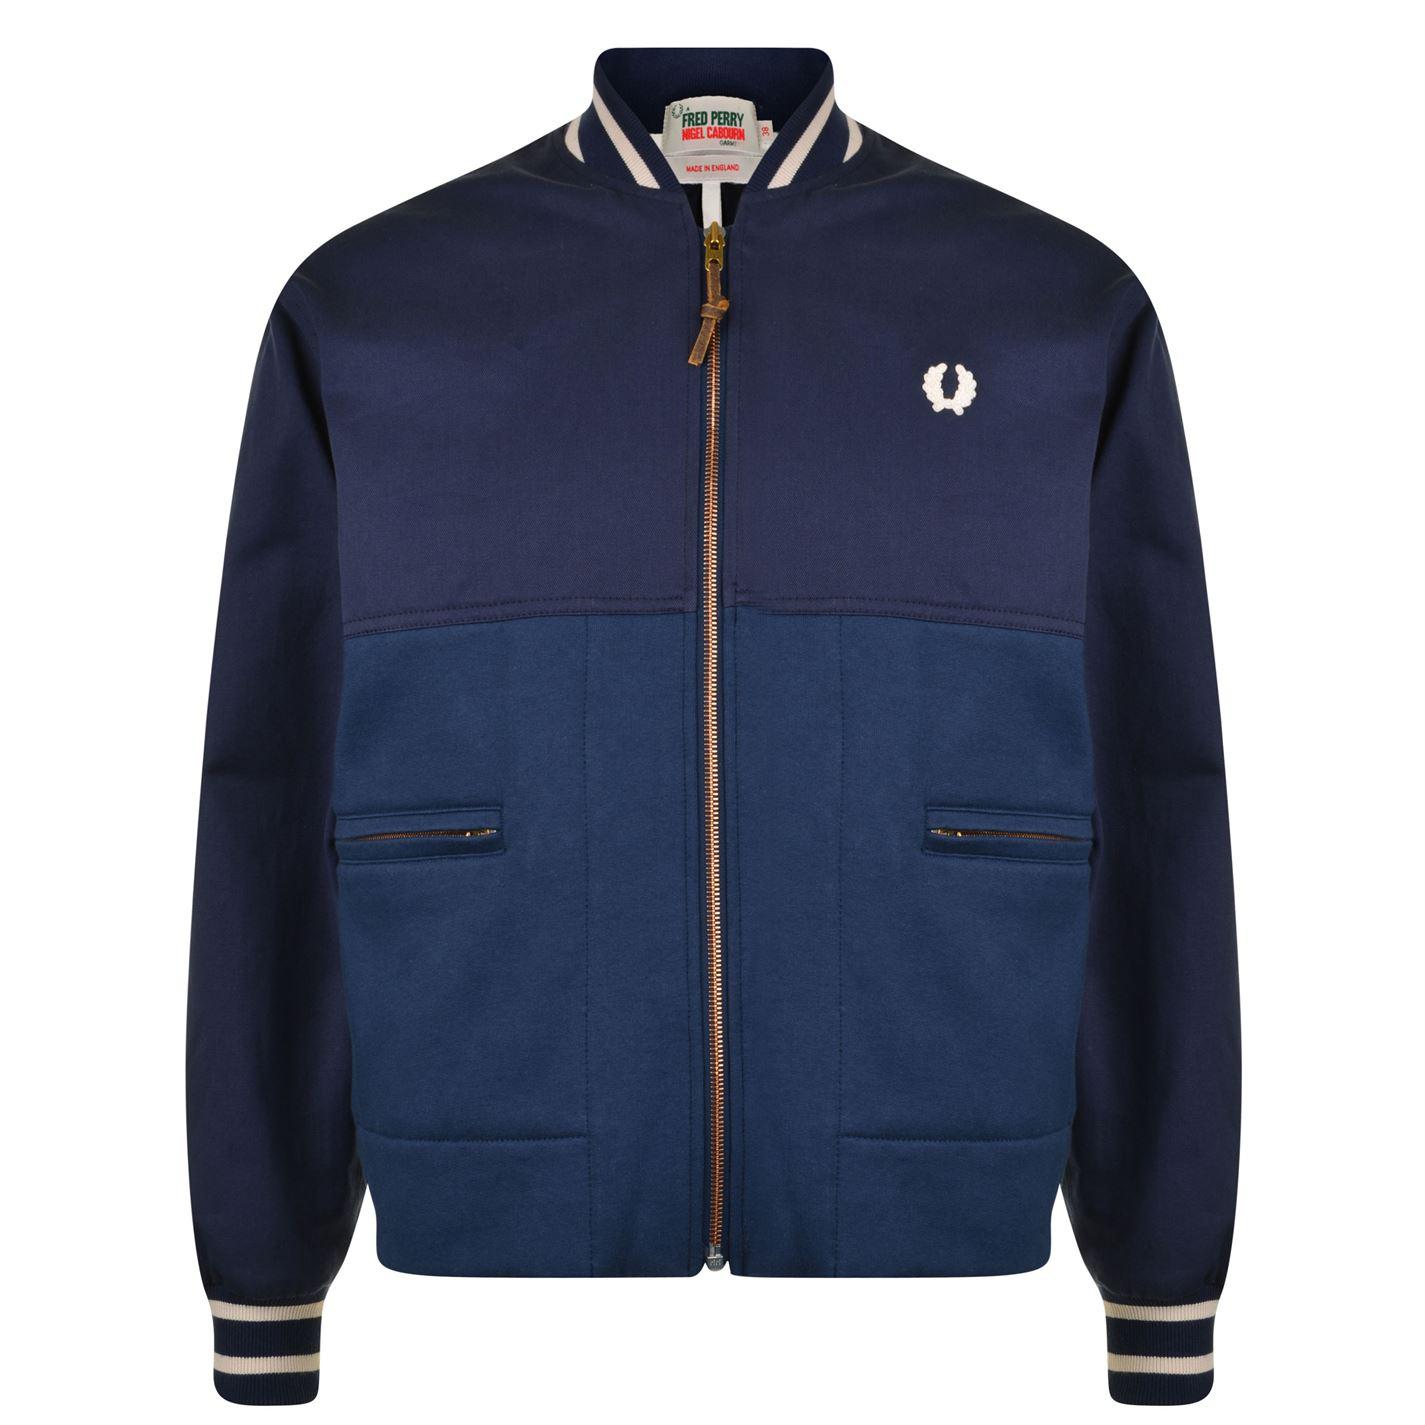 fredperry-nigel-cabourn-bomber-jacket